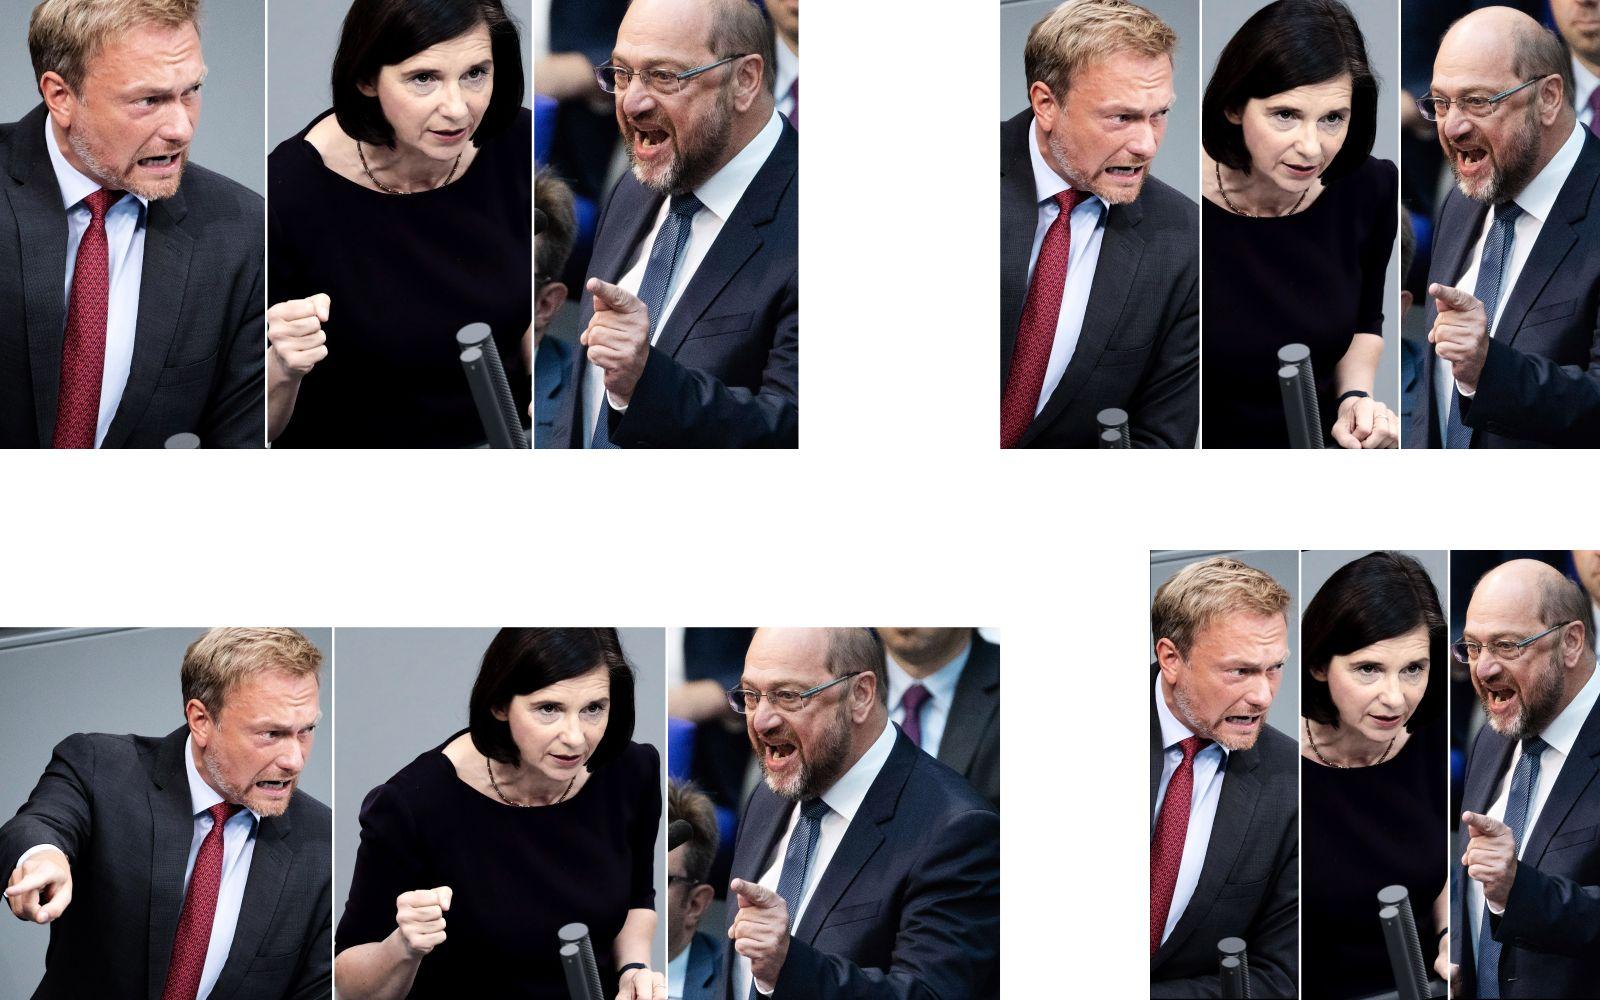 EINMALIGE VERWENDUNG COMBO/ Lindner/ Göring-Eckardt/ Schulz